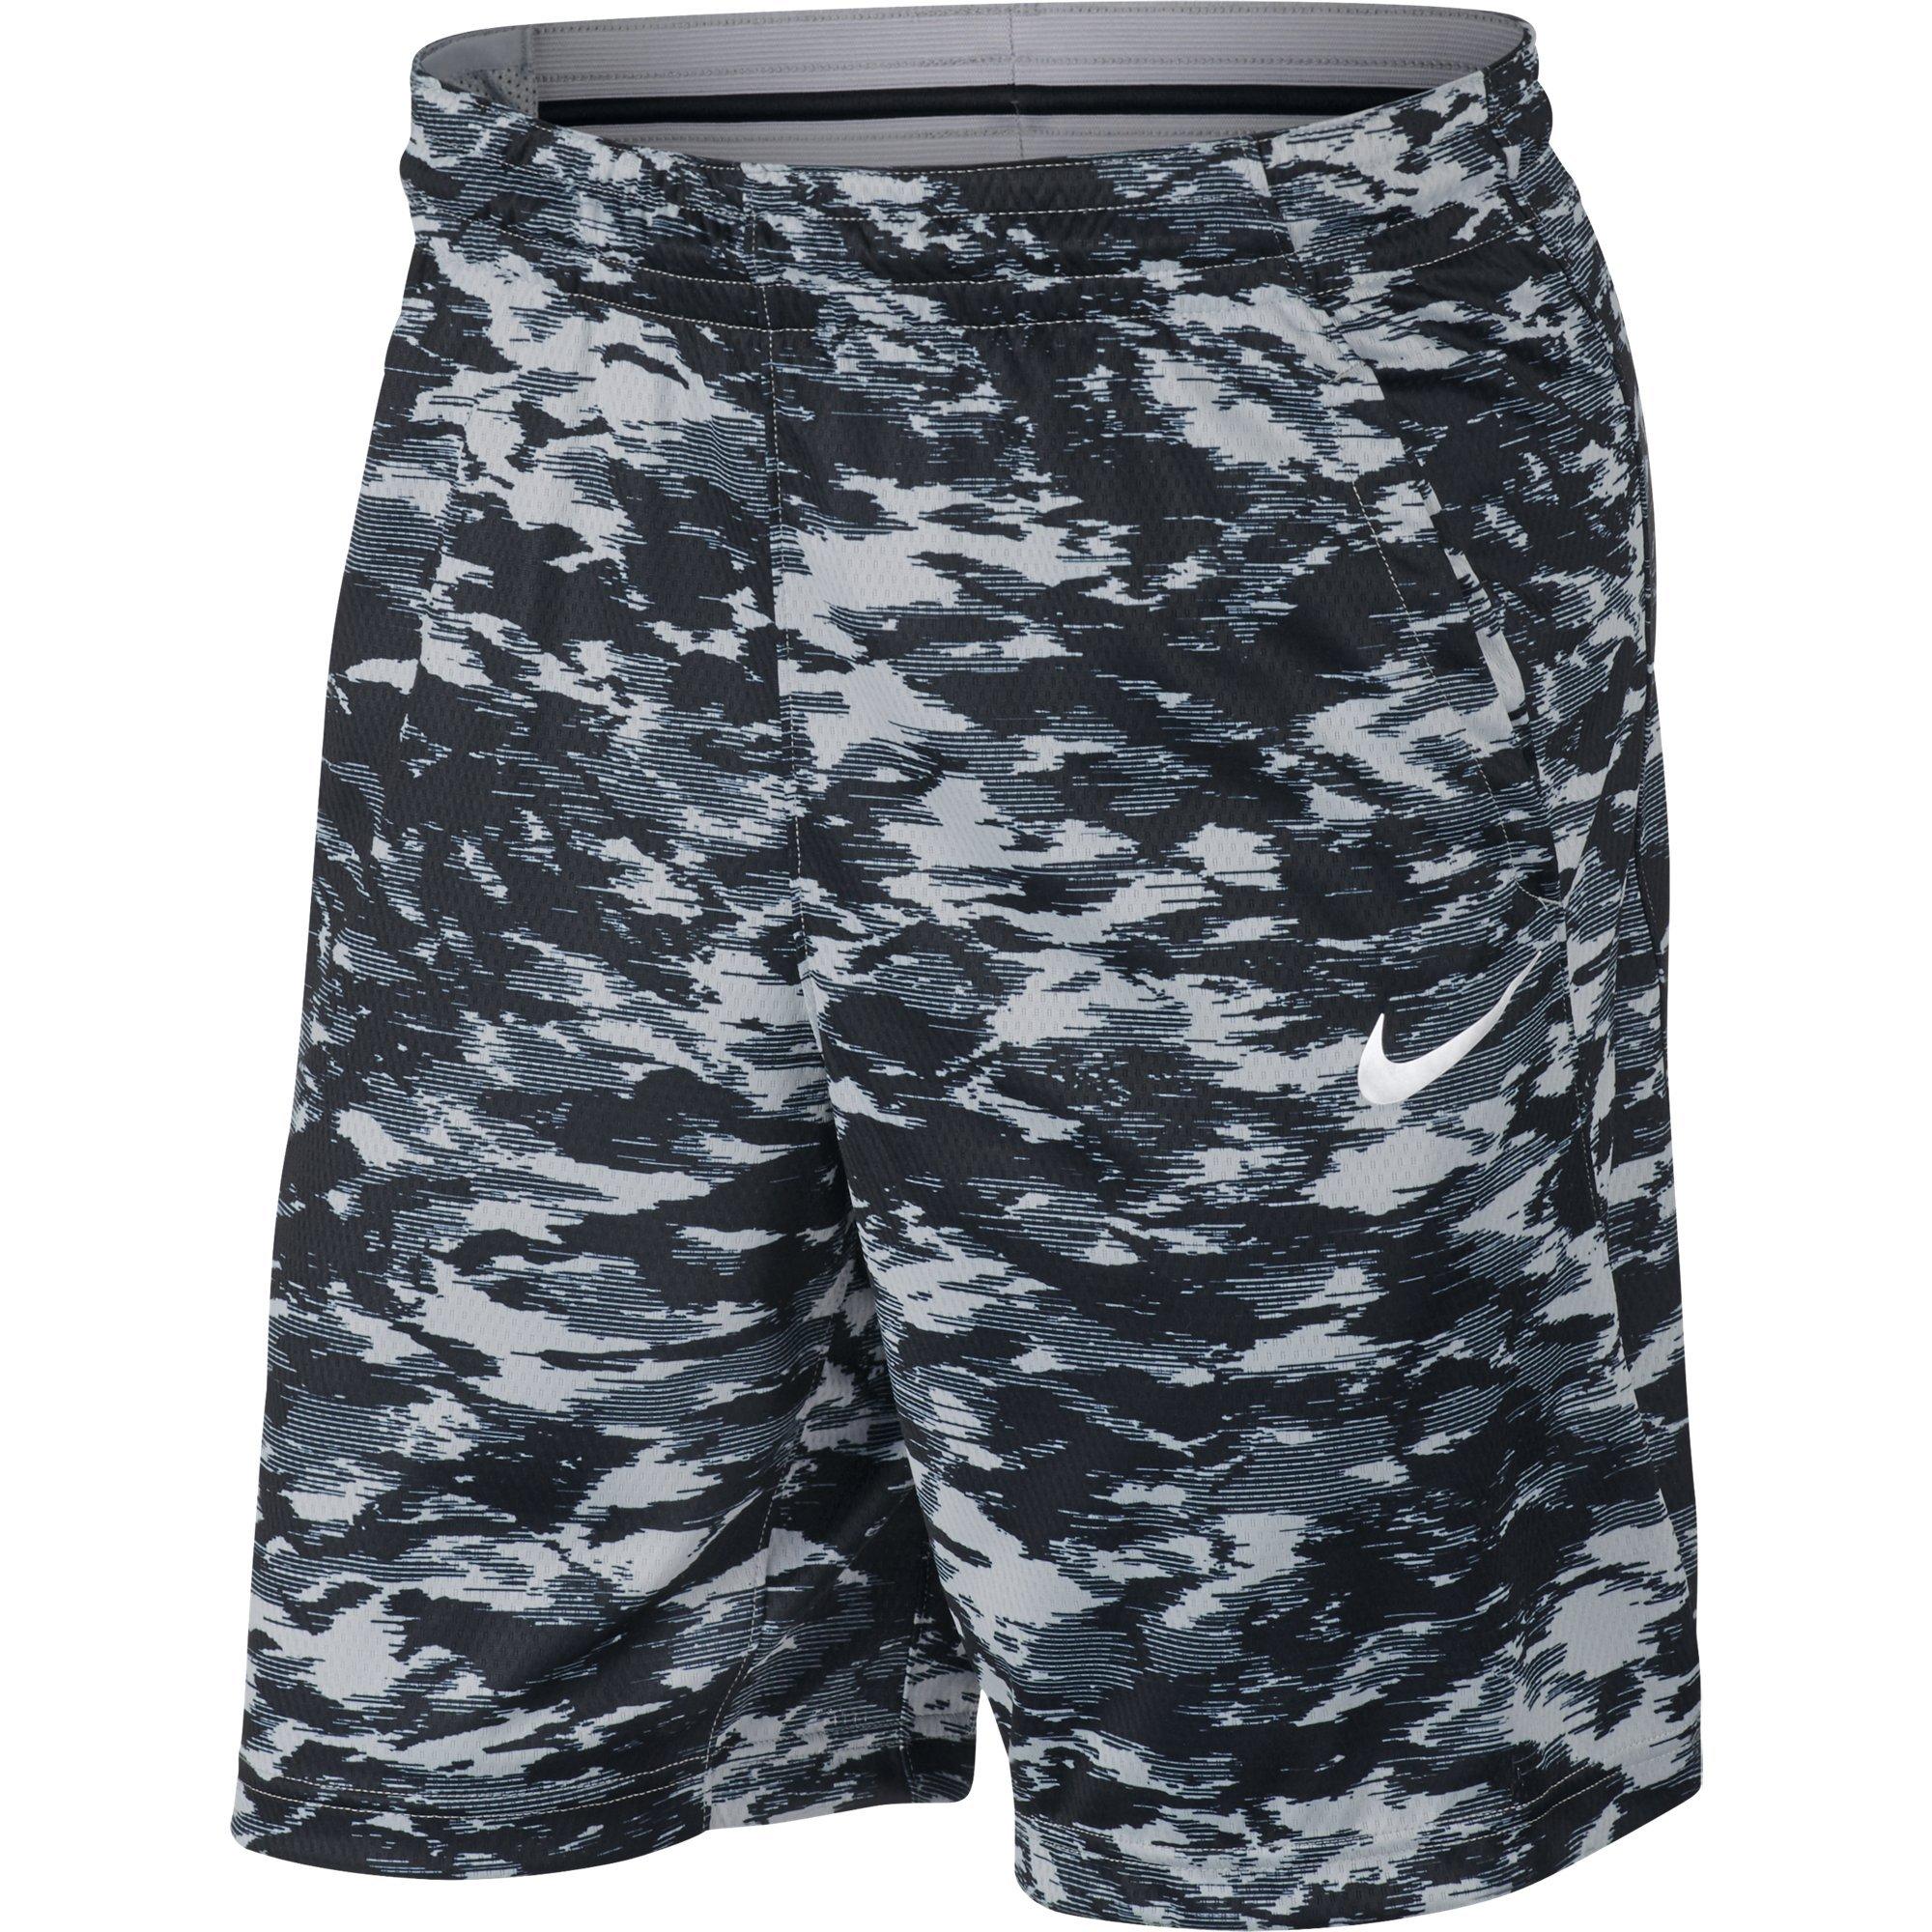 NIKE Men's Dry Print Attack Shorts, Wolf Grey/Black/White, XX-Large